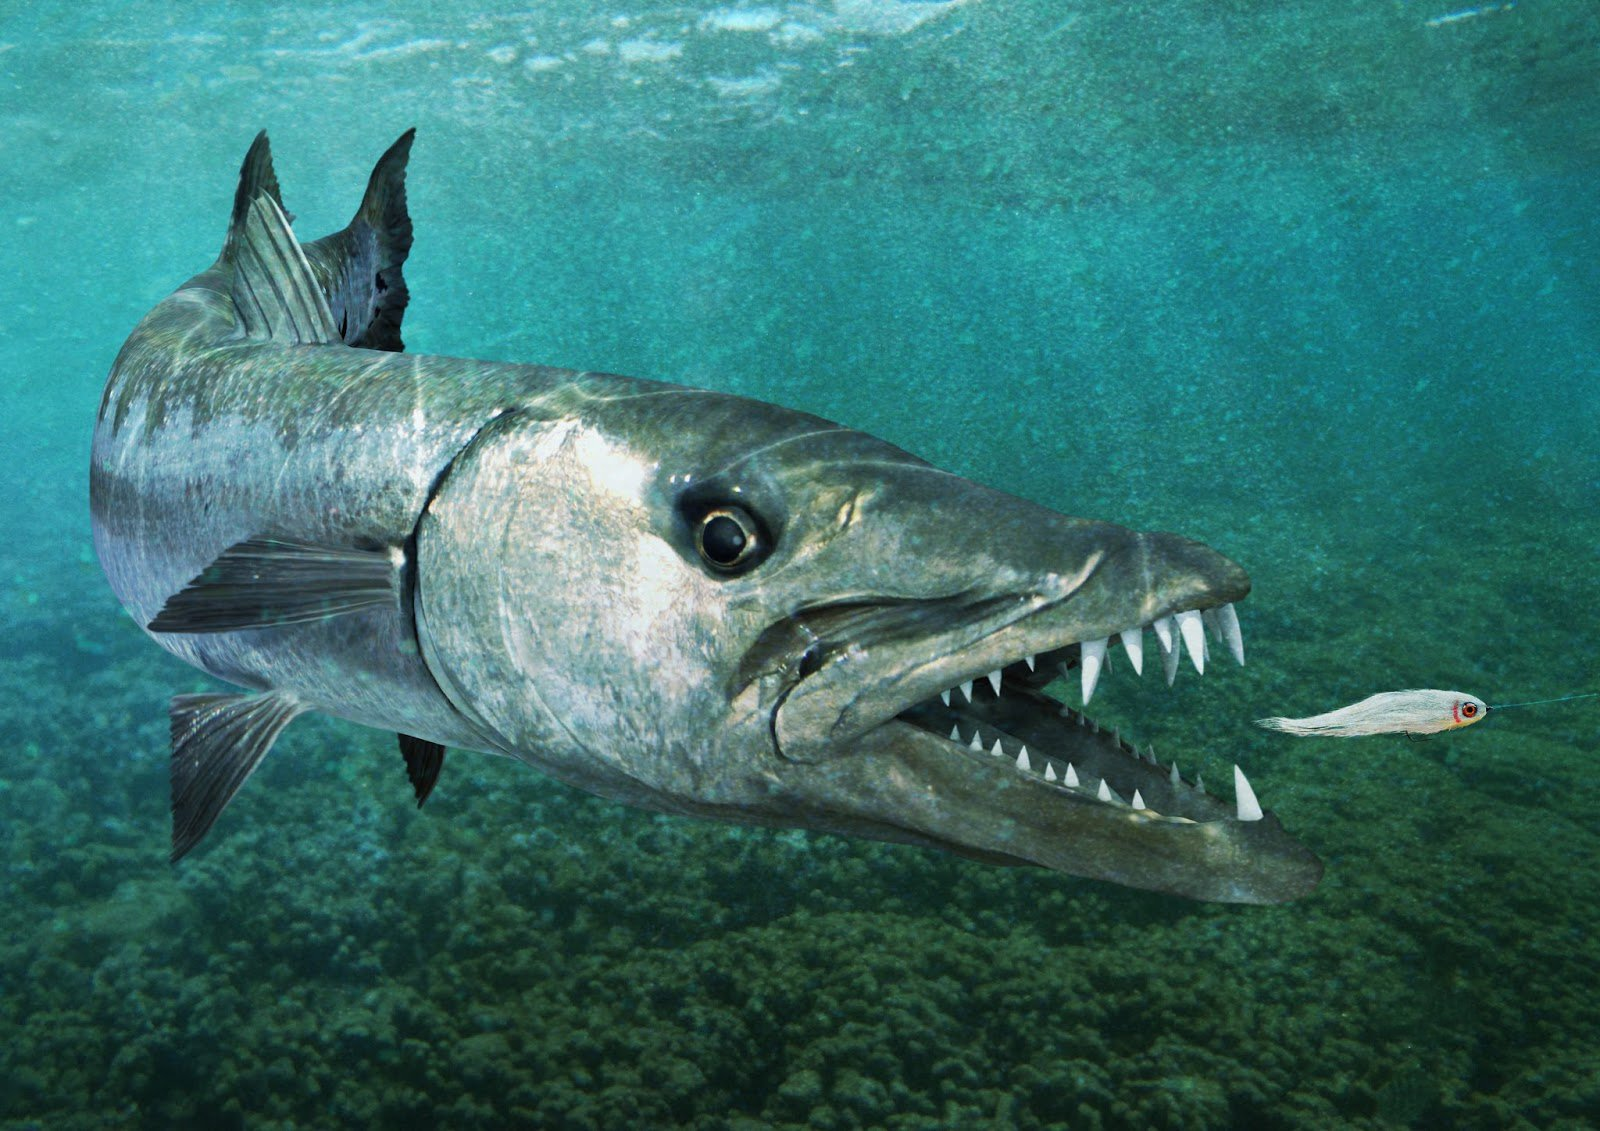 Барракуда на охоте за рыбёшкой